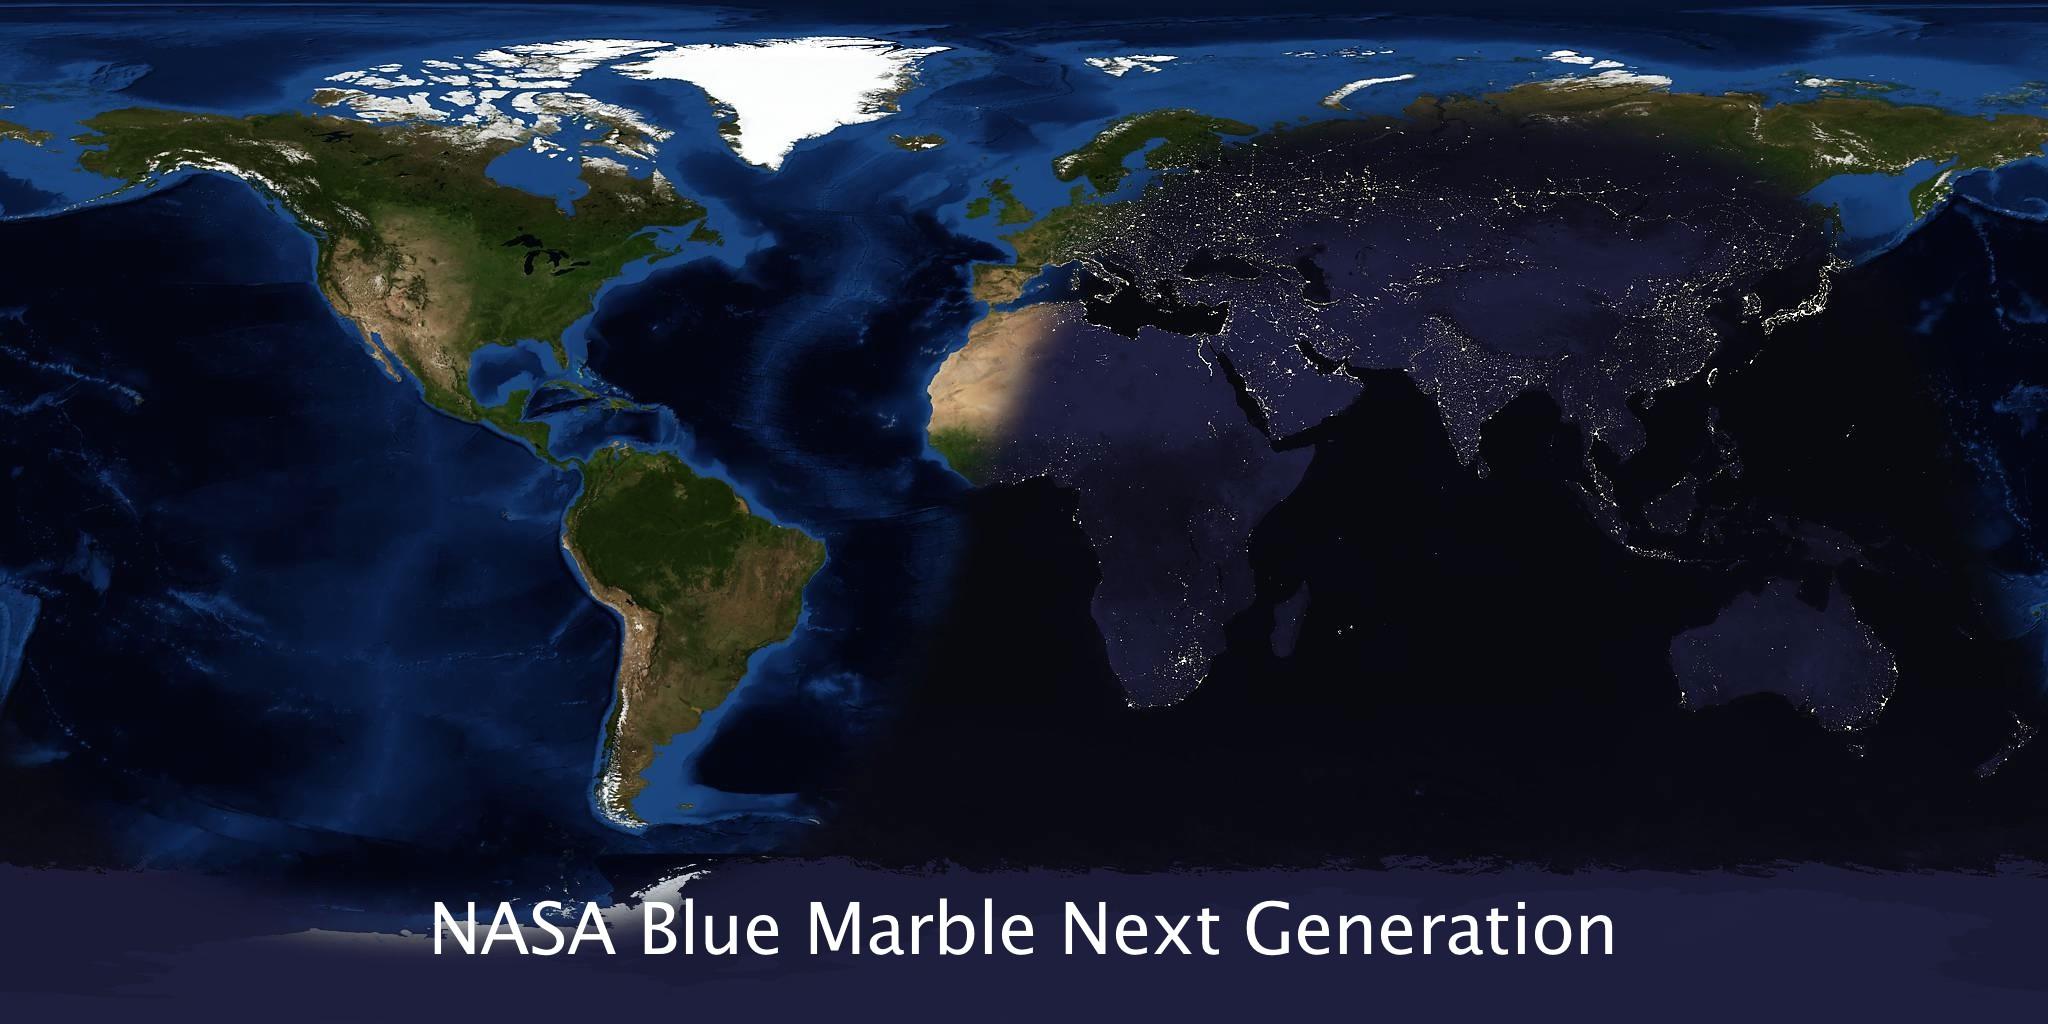 nasa blue marble 2017 - photo #28